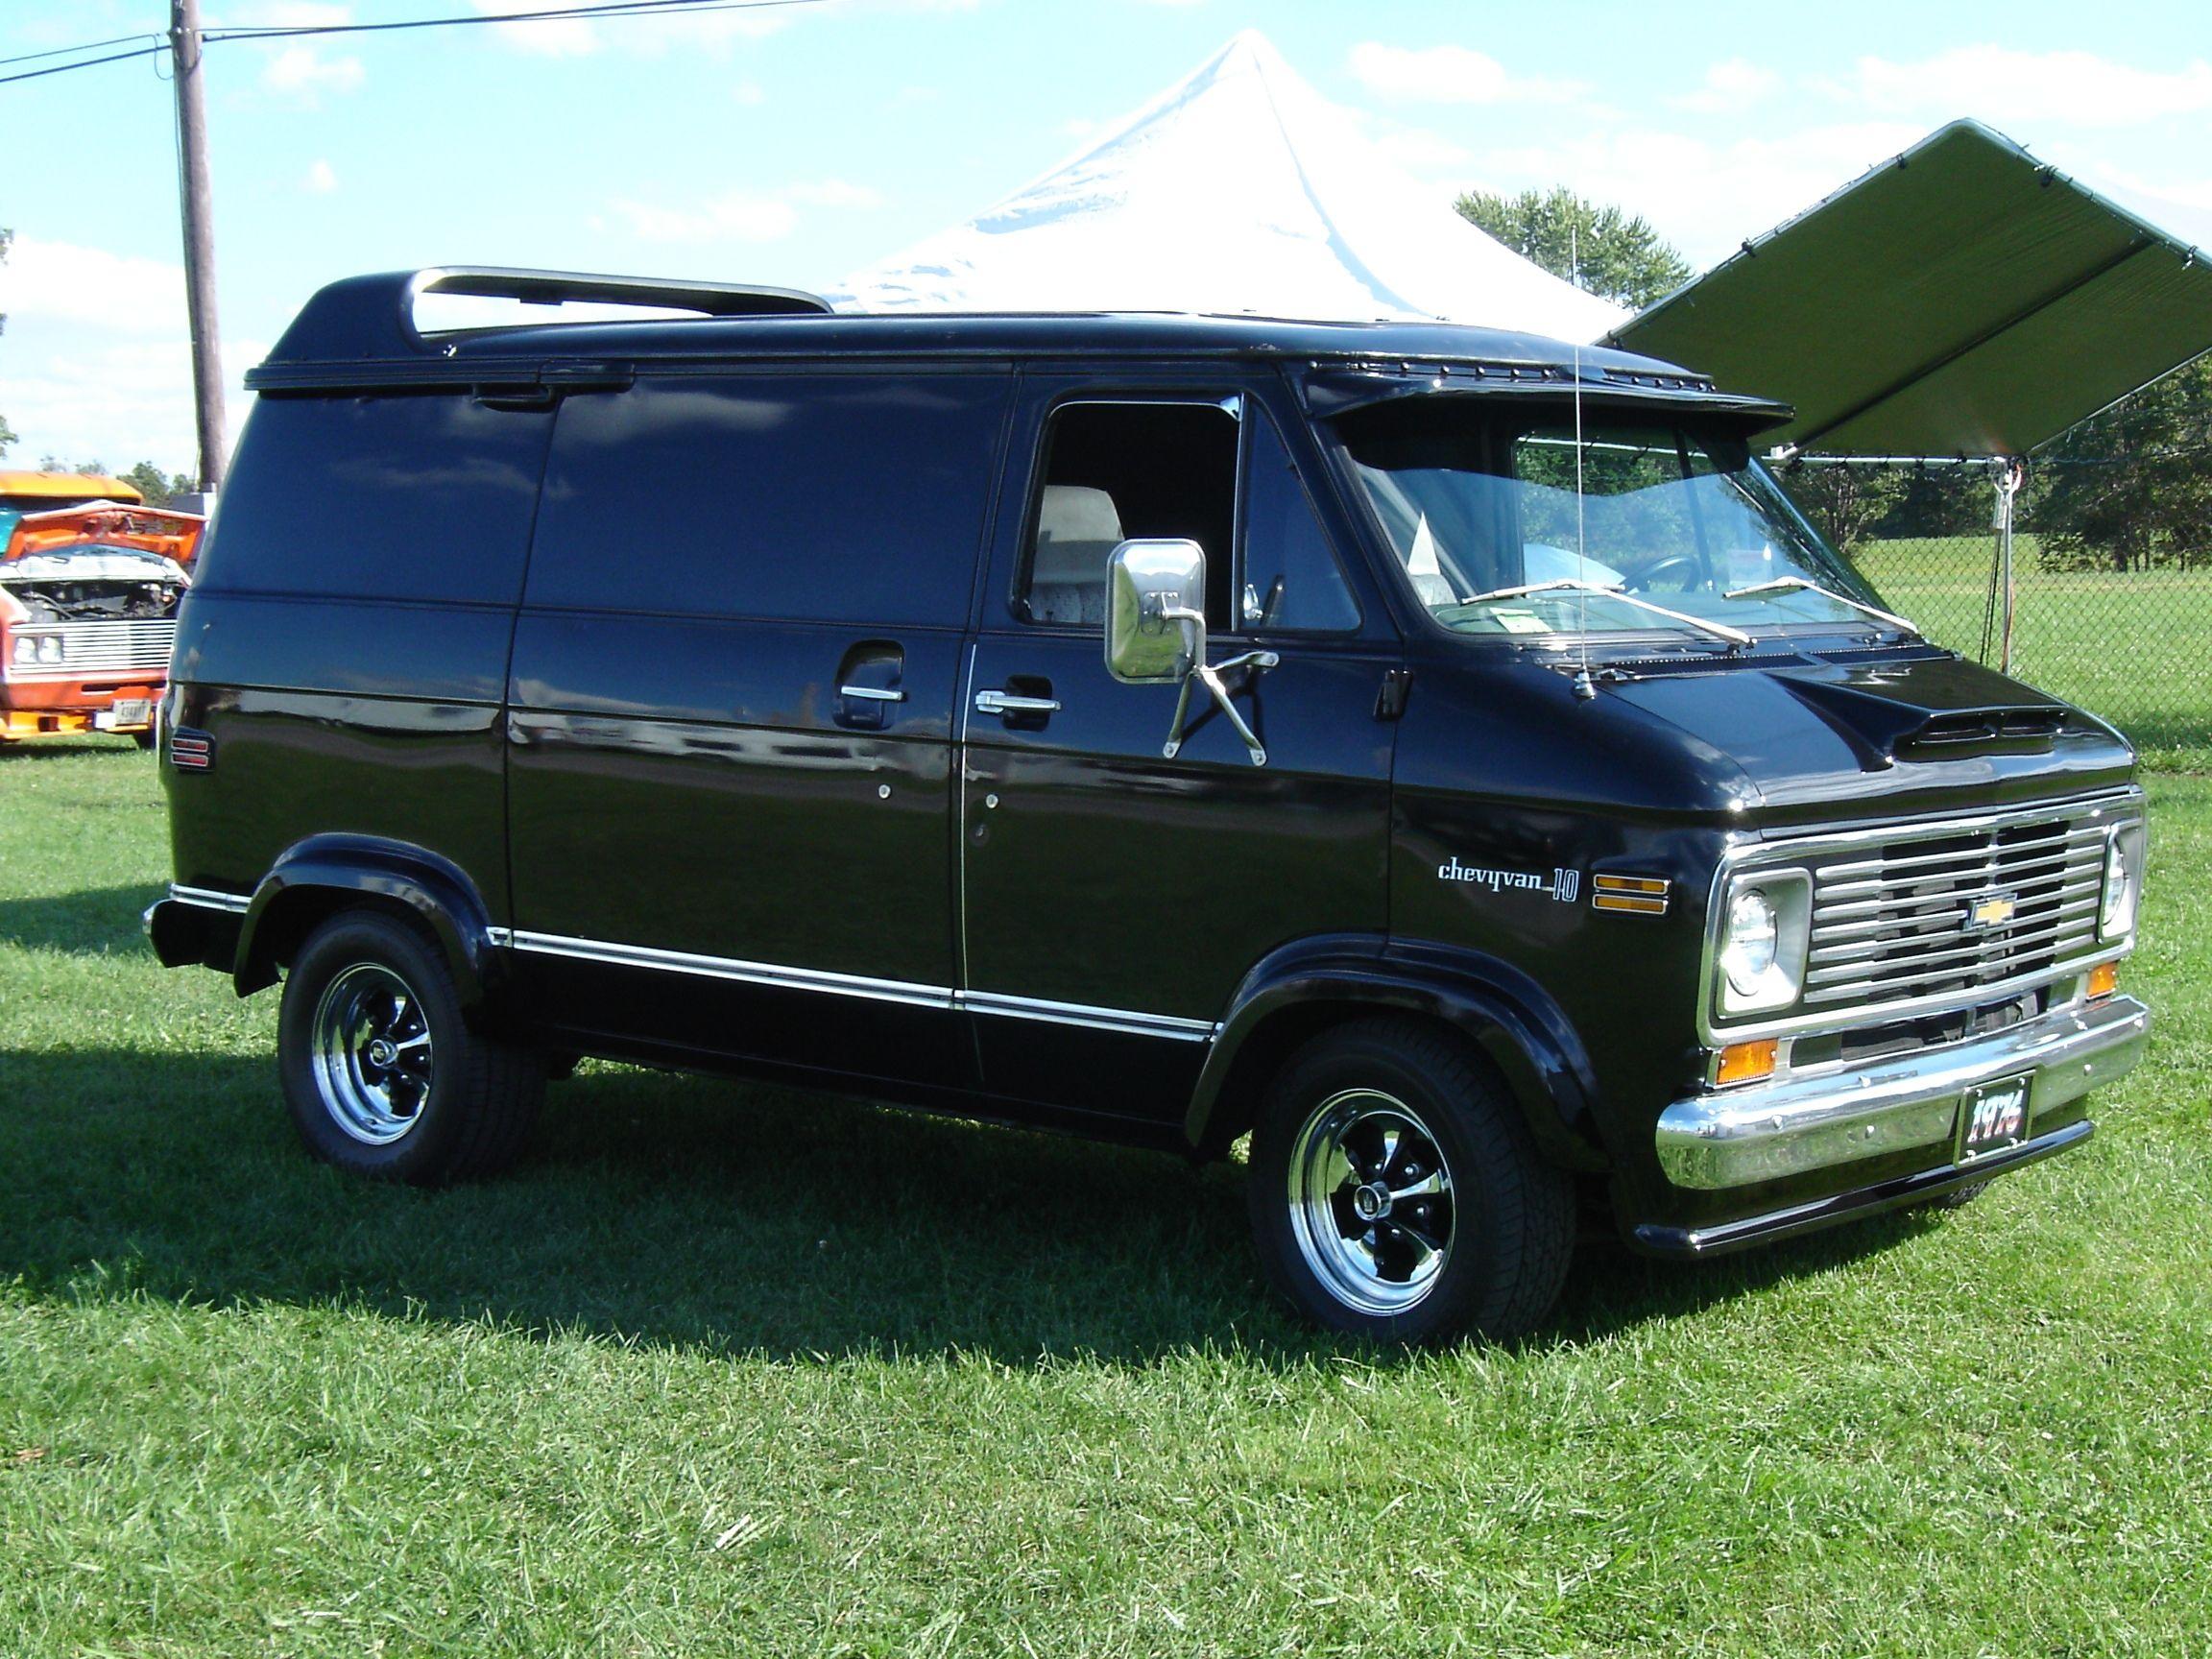 radarlovevan 39 s 1976 chevrolet g series g10 in slippery rock pa custom chevy vans 1971 96. Black Bedroom Furniture Sets. Home Design Ideas